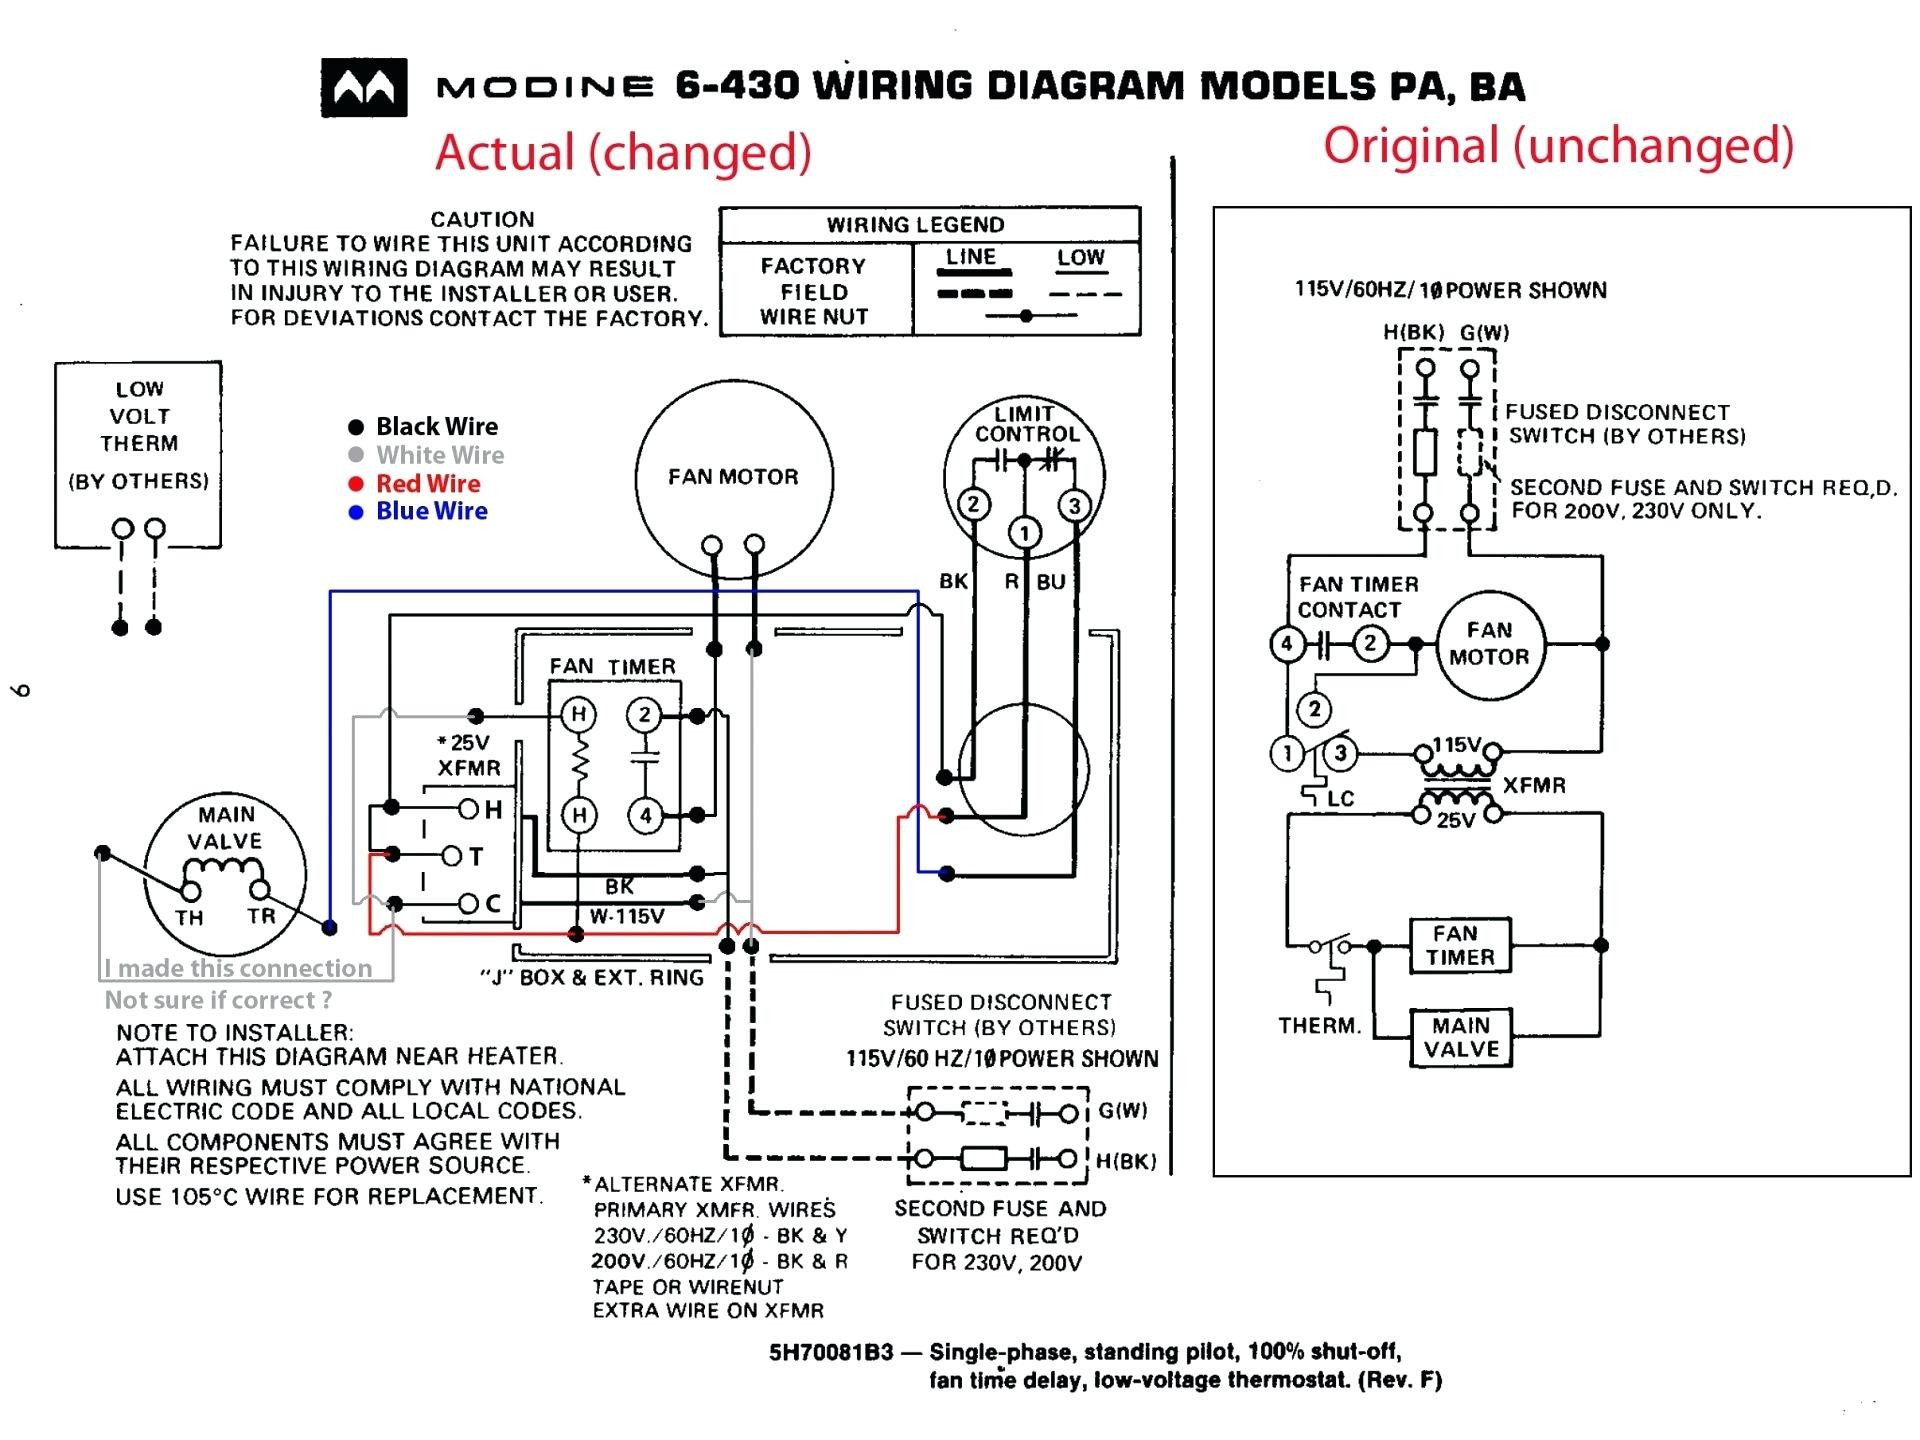 Car Heater Blower Motor Wiring Diagram Hvac Blower Motor Wiring Diagram Trane Furnace Older Gas Basic Of Car Heater Blower Motor Wiring Diagram